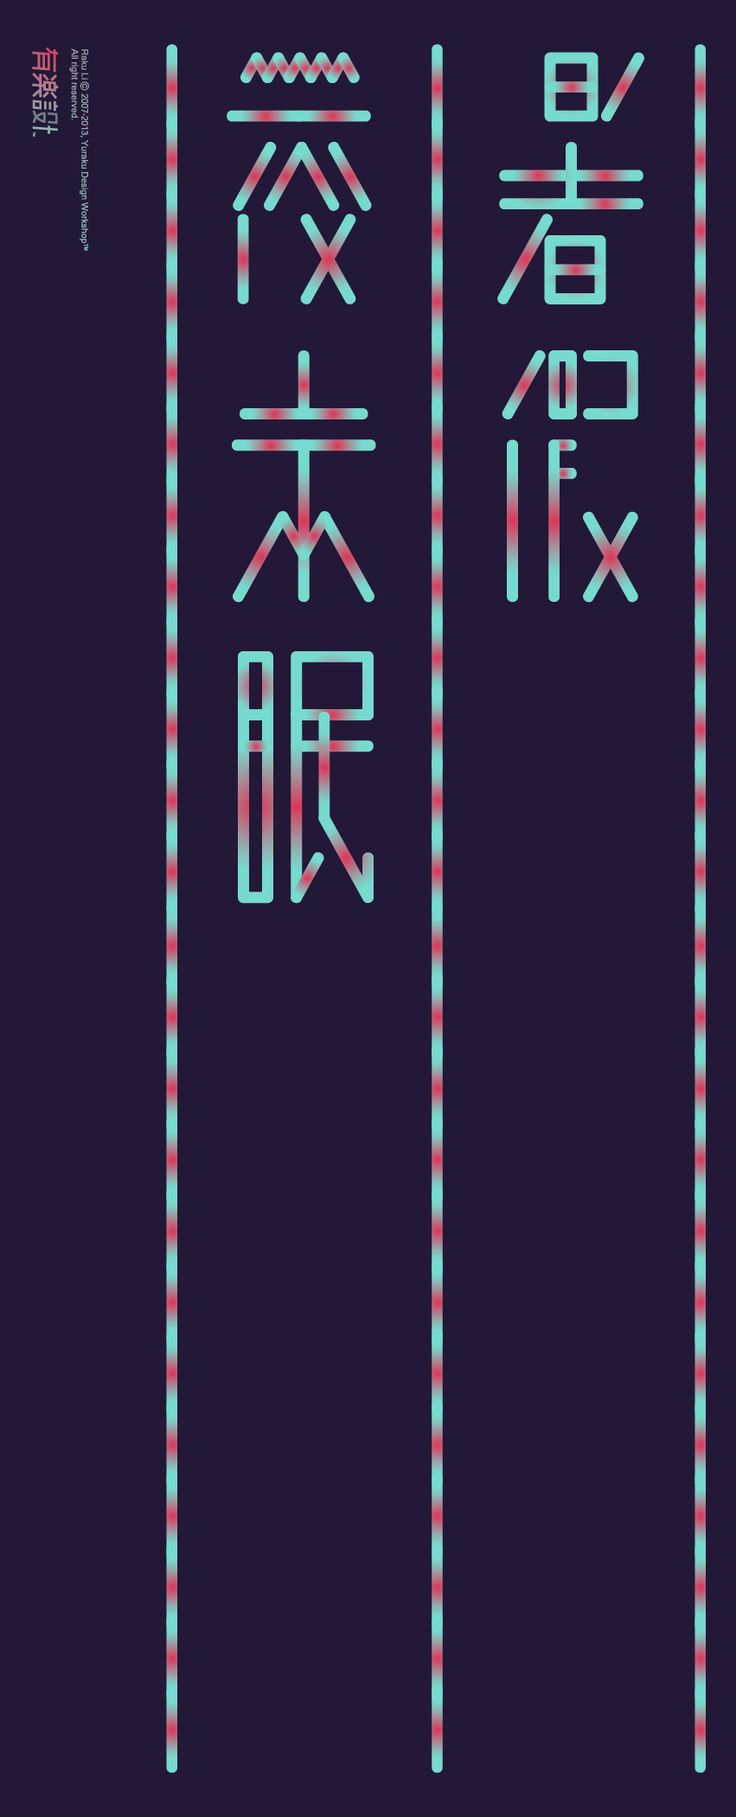 暑假夜未眠 Raku Li© 2007-2013, Yuraku Design Workshop™ All right reserved./Designed in Taiwan